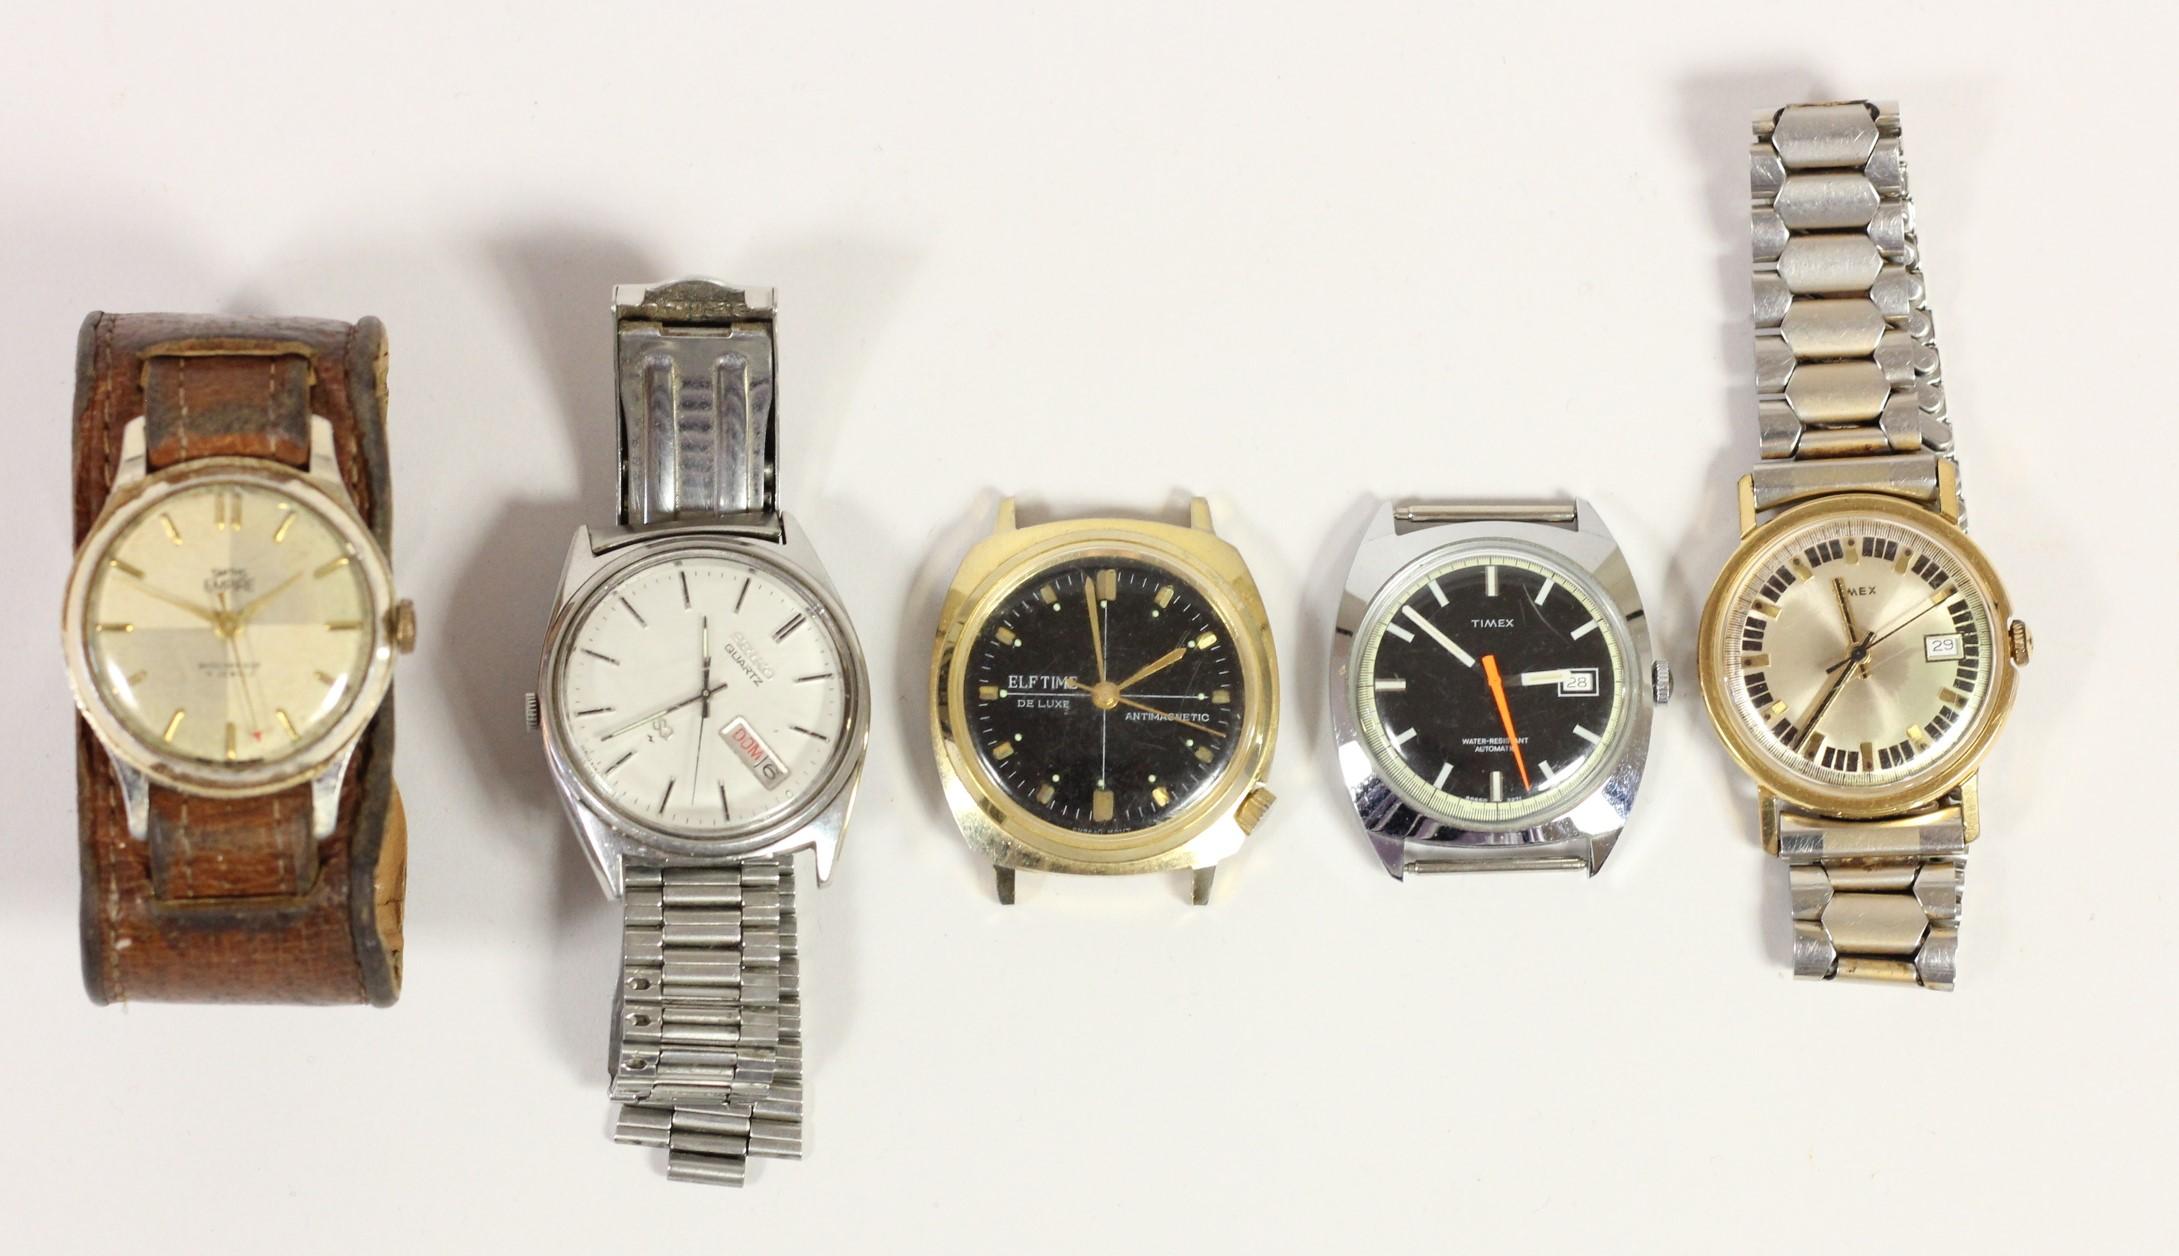 A Smiths Empire manual wind wristwatch, a Seiko quartz day/date wristwatch and three other